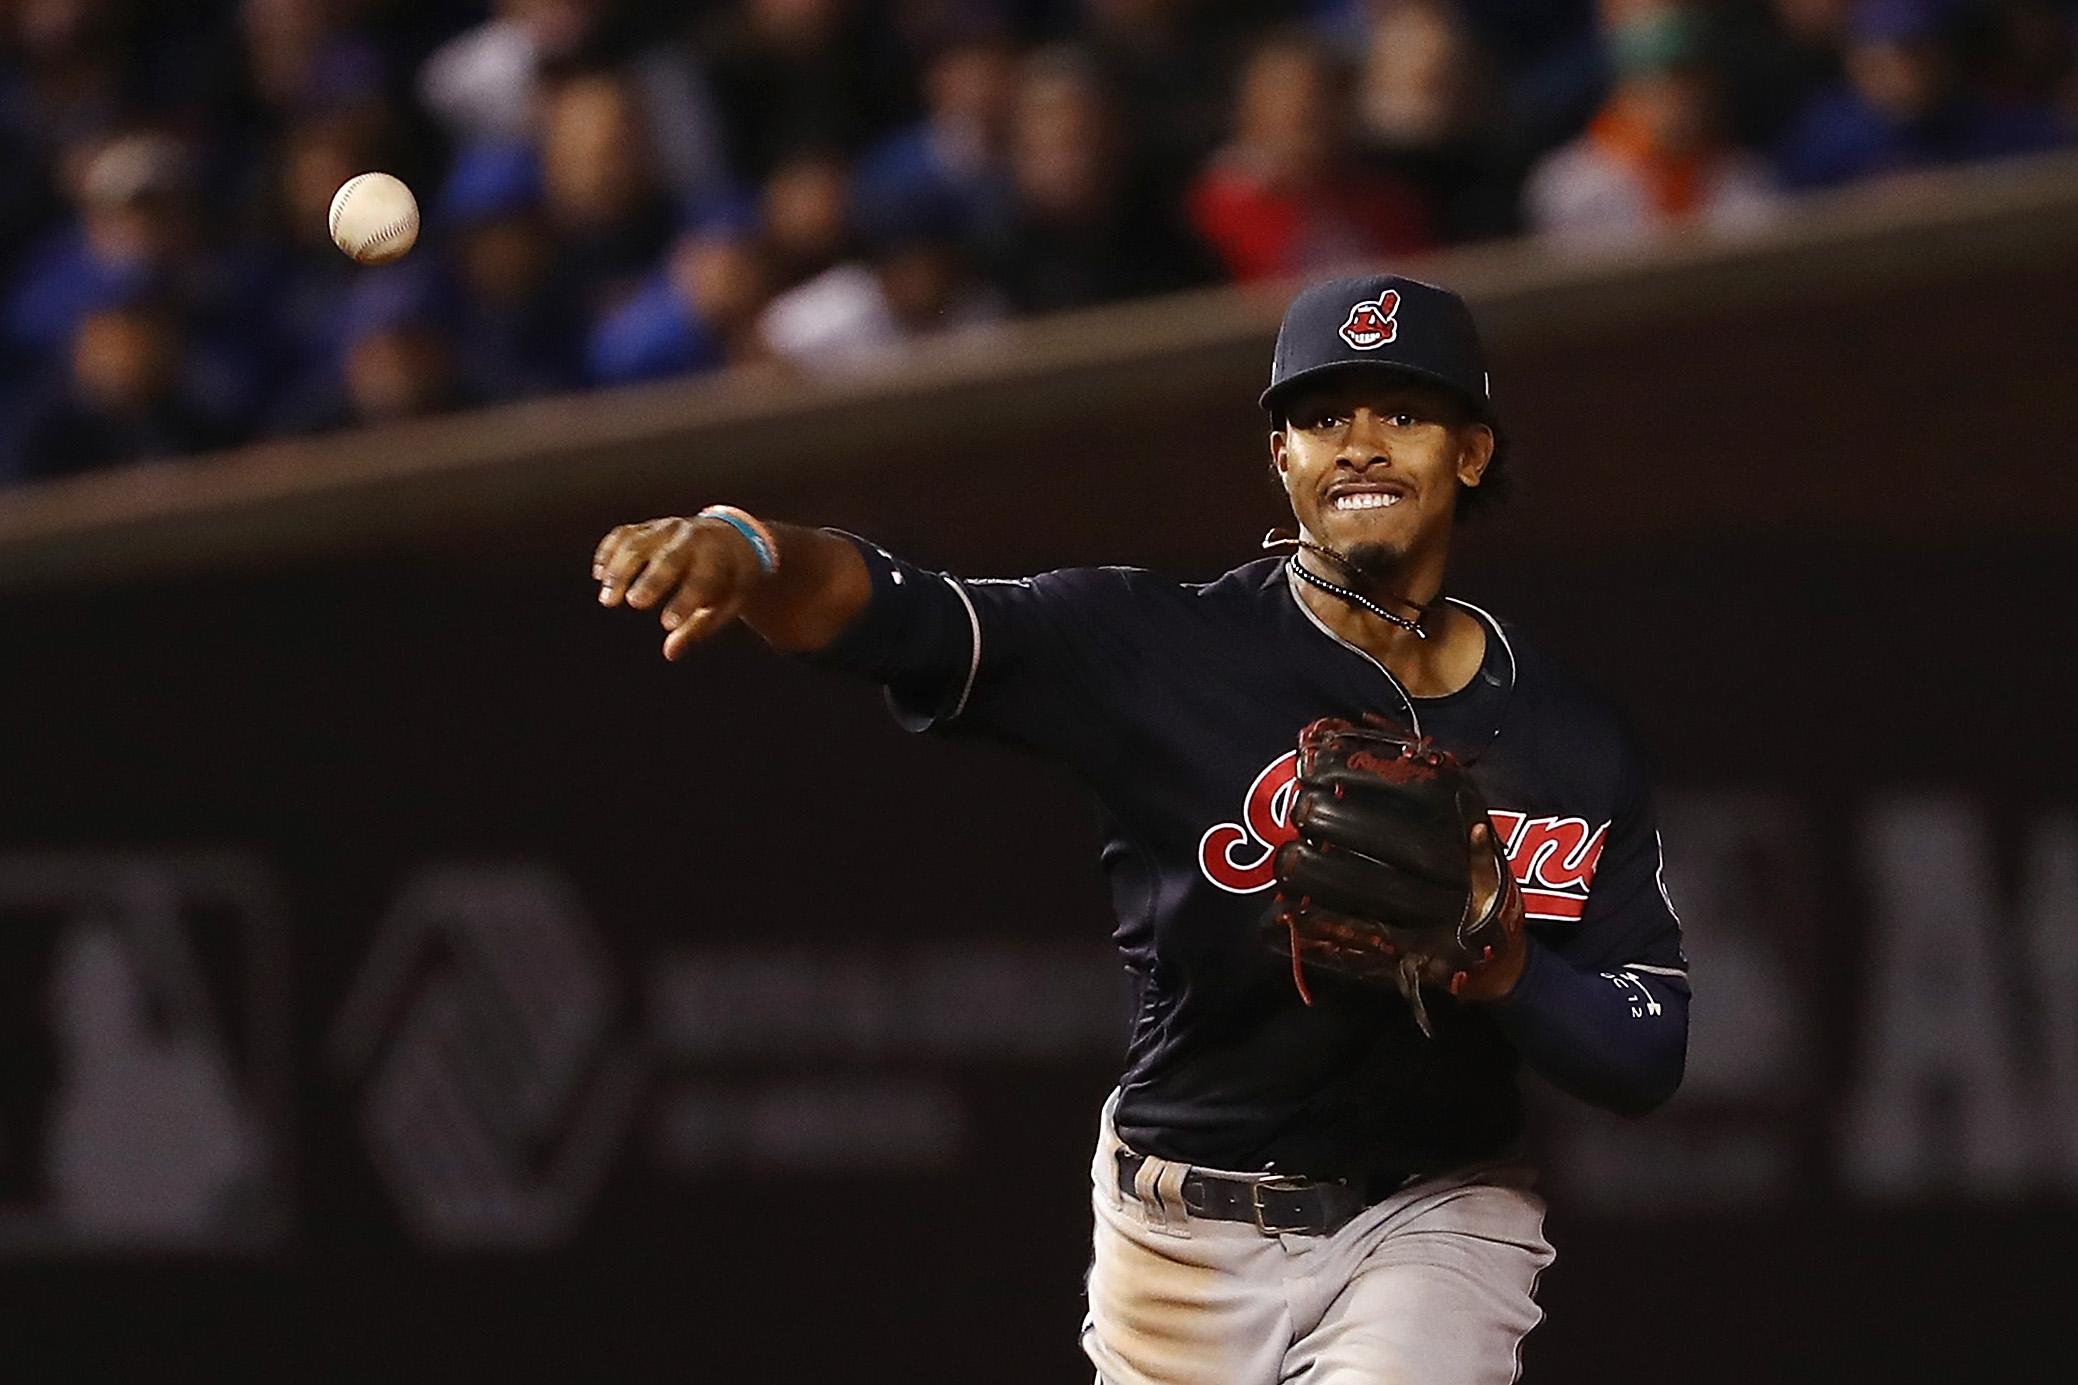 Francisco Lindor's PostseasonShowcasing Why He's Baseball's Best Young Shortstop